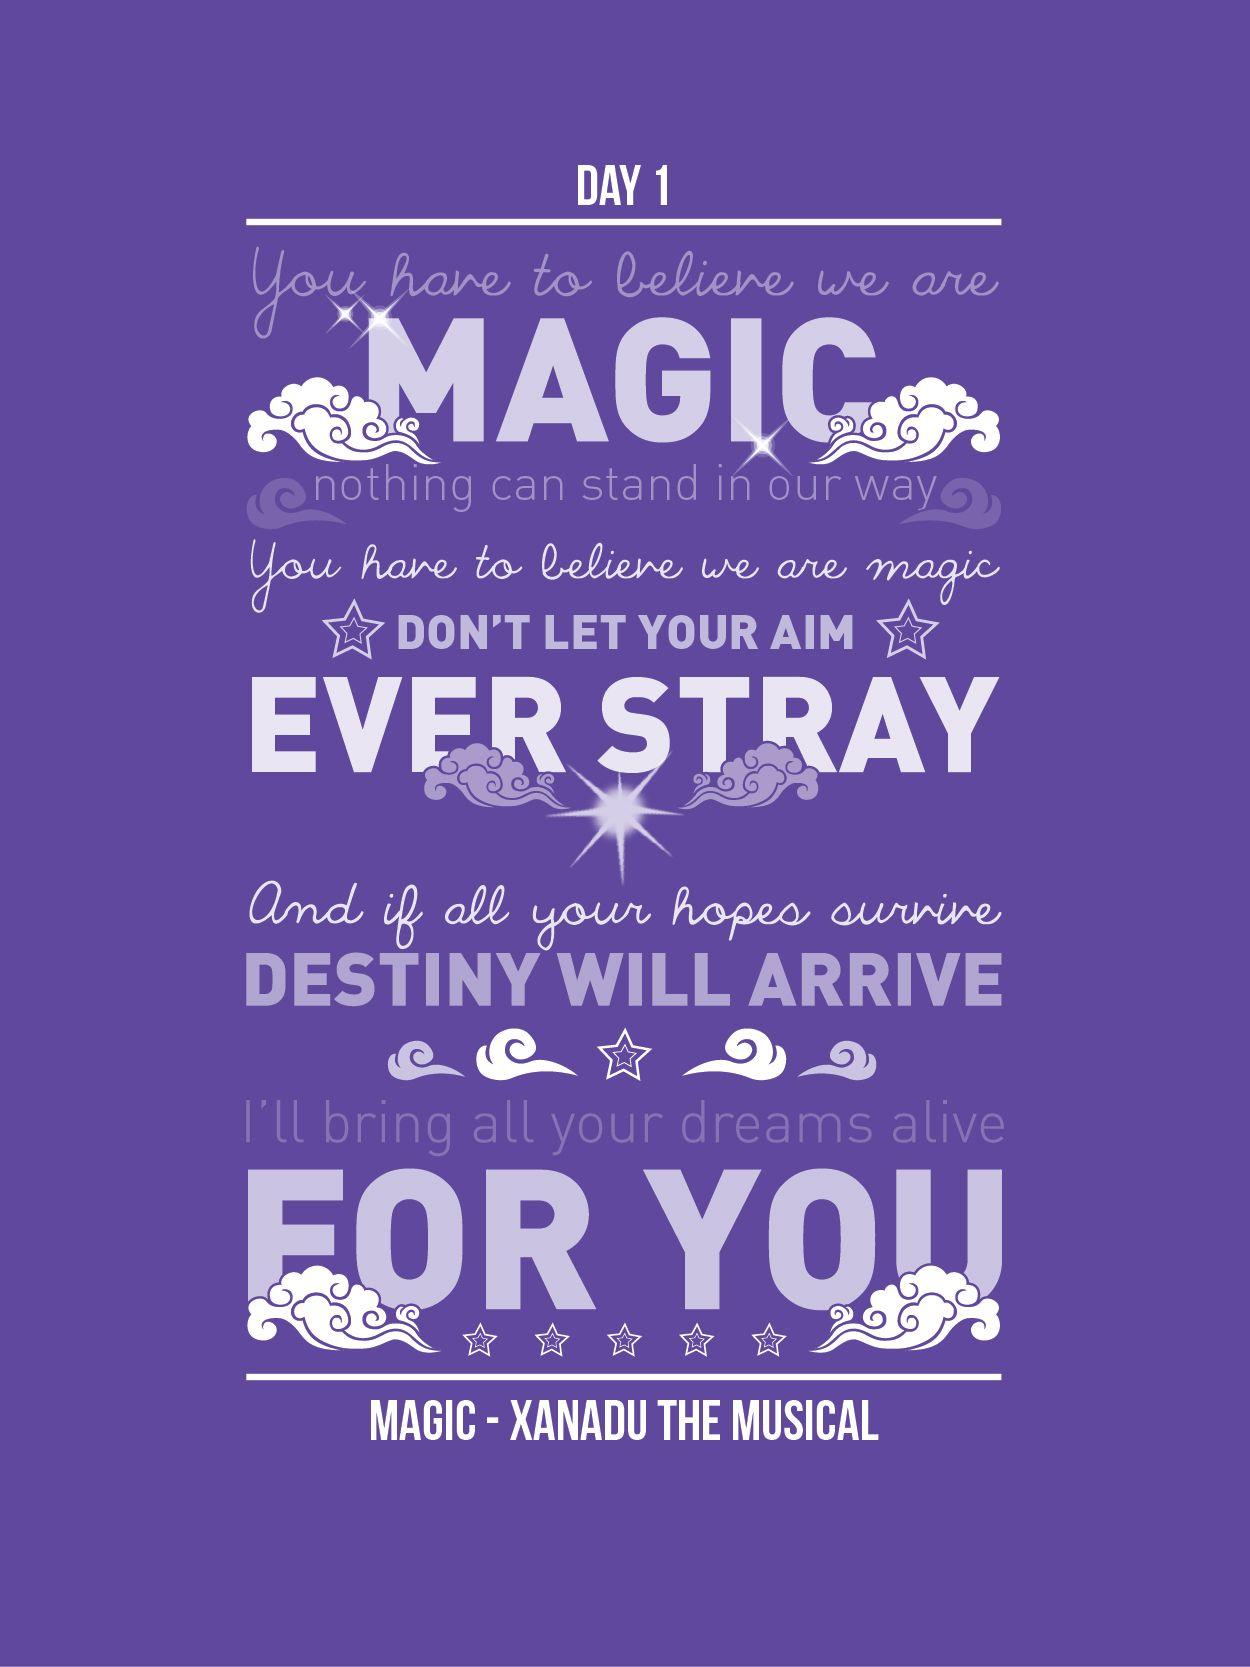 Day 1 Magic 30 Days Of Lyrical Typography Http Wp Me P45g5z X Via Wordpress Com